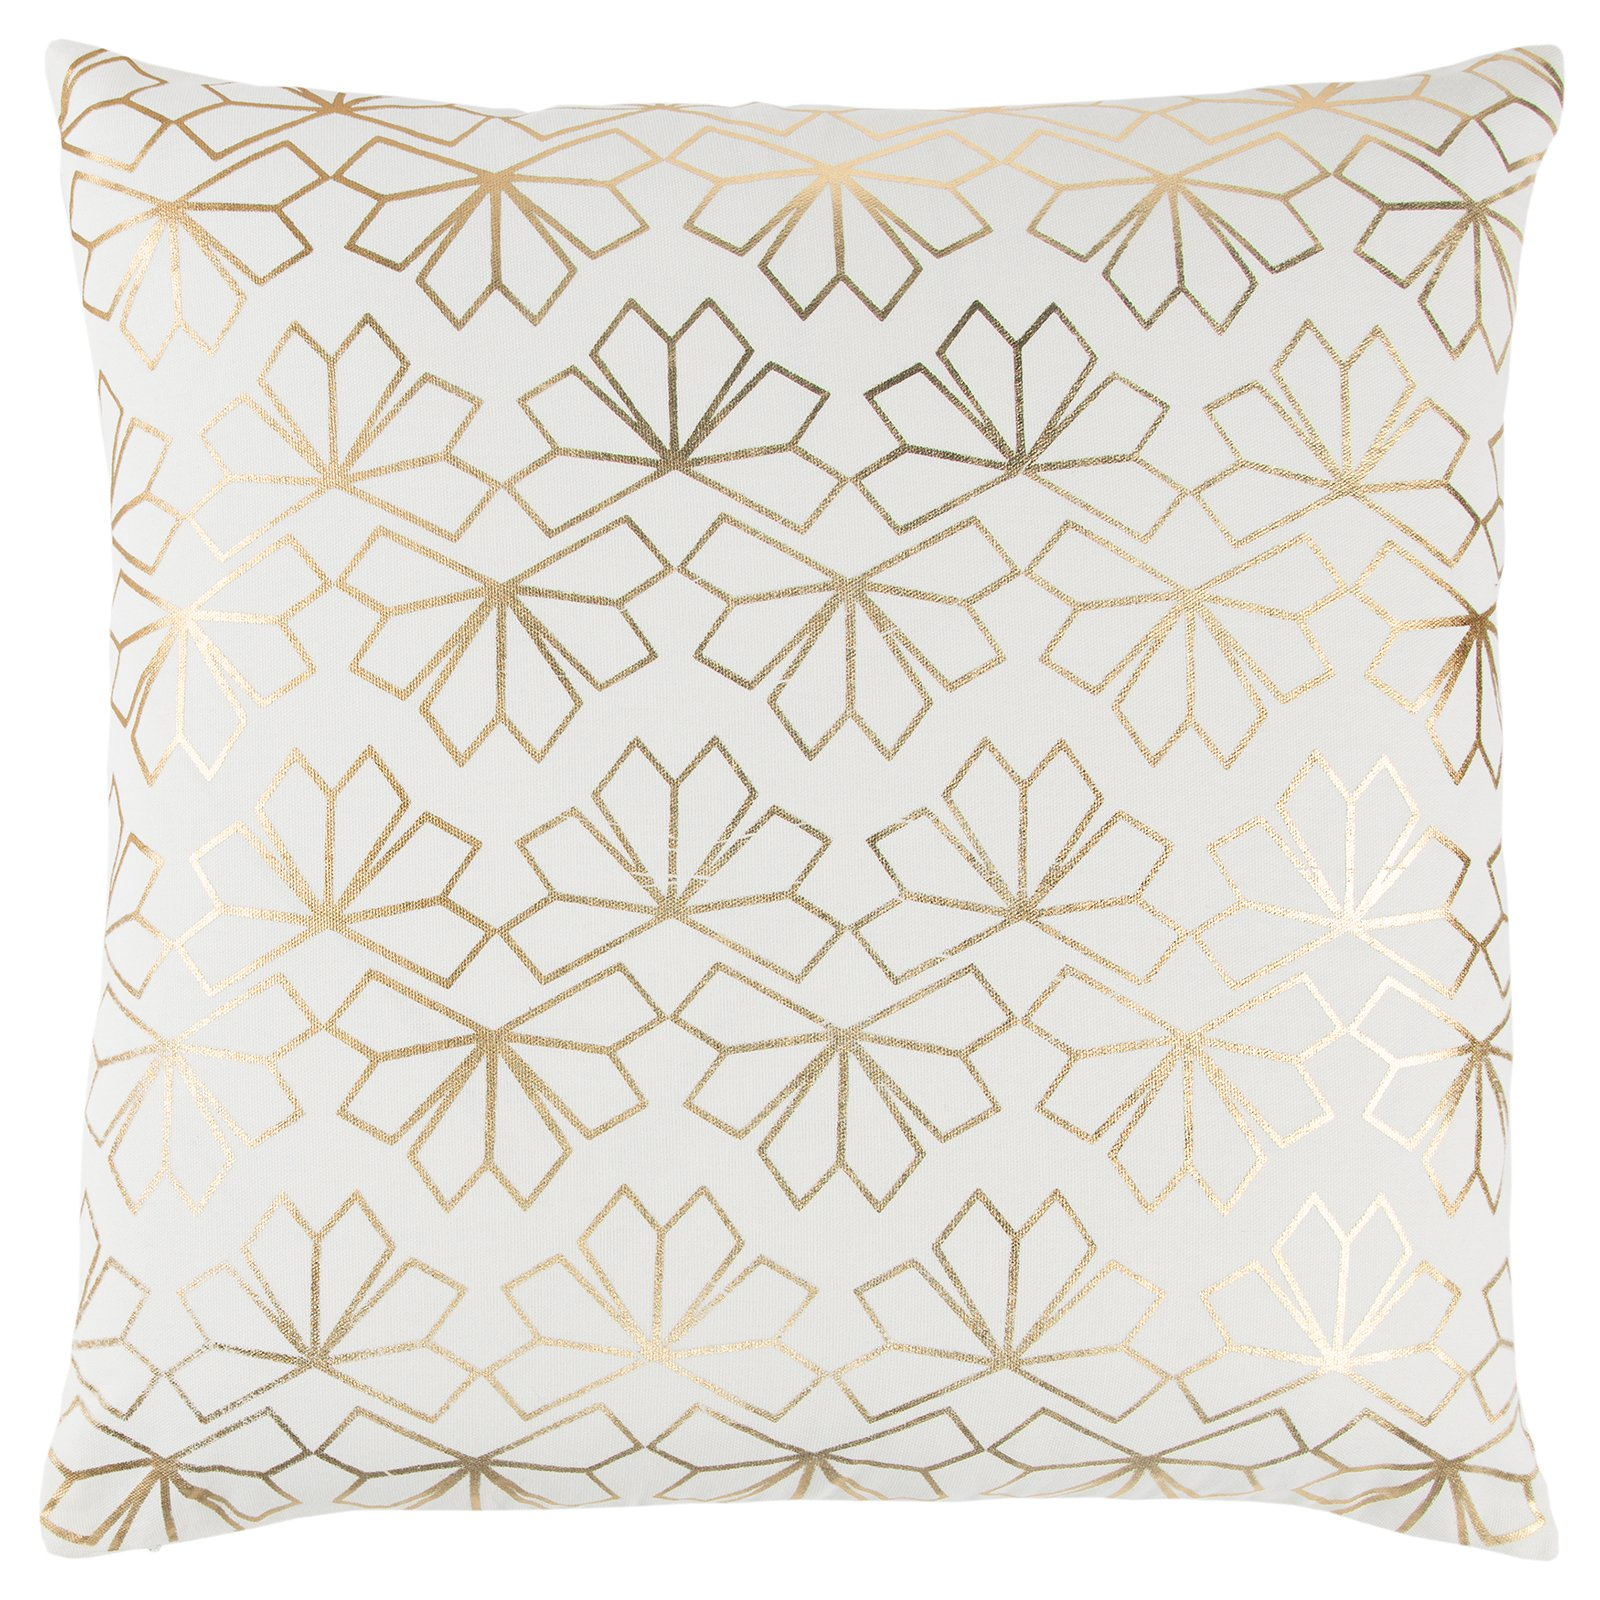 Rizzy Home Geometric Metallic Flower Decorative Pillow